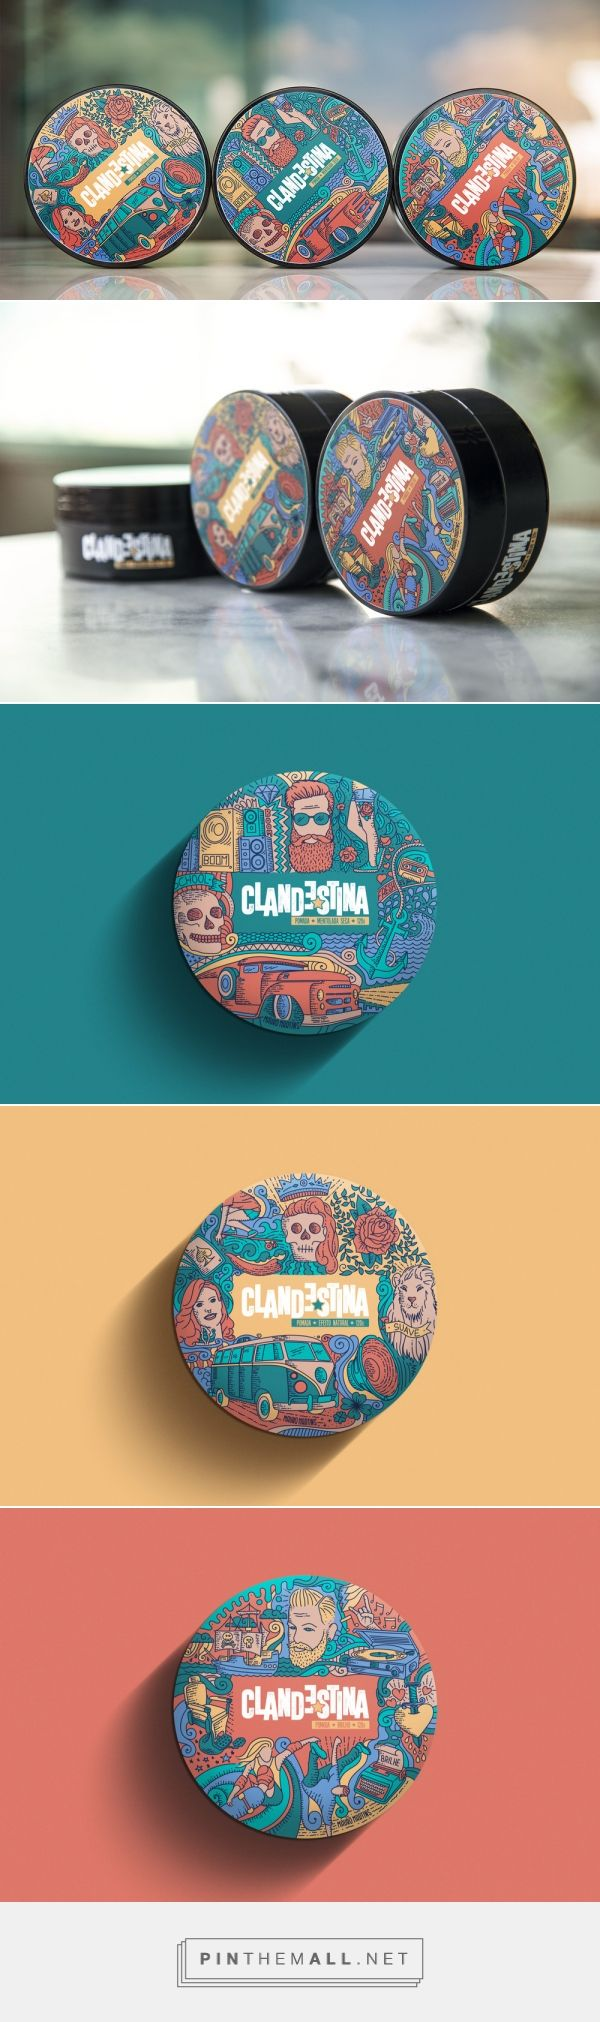 Clandestina Hair Pomades — The Dieline - Branding & Packaging Design - created via https://pinthemall.net